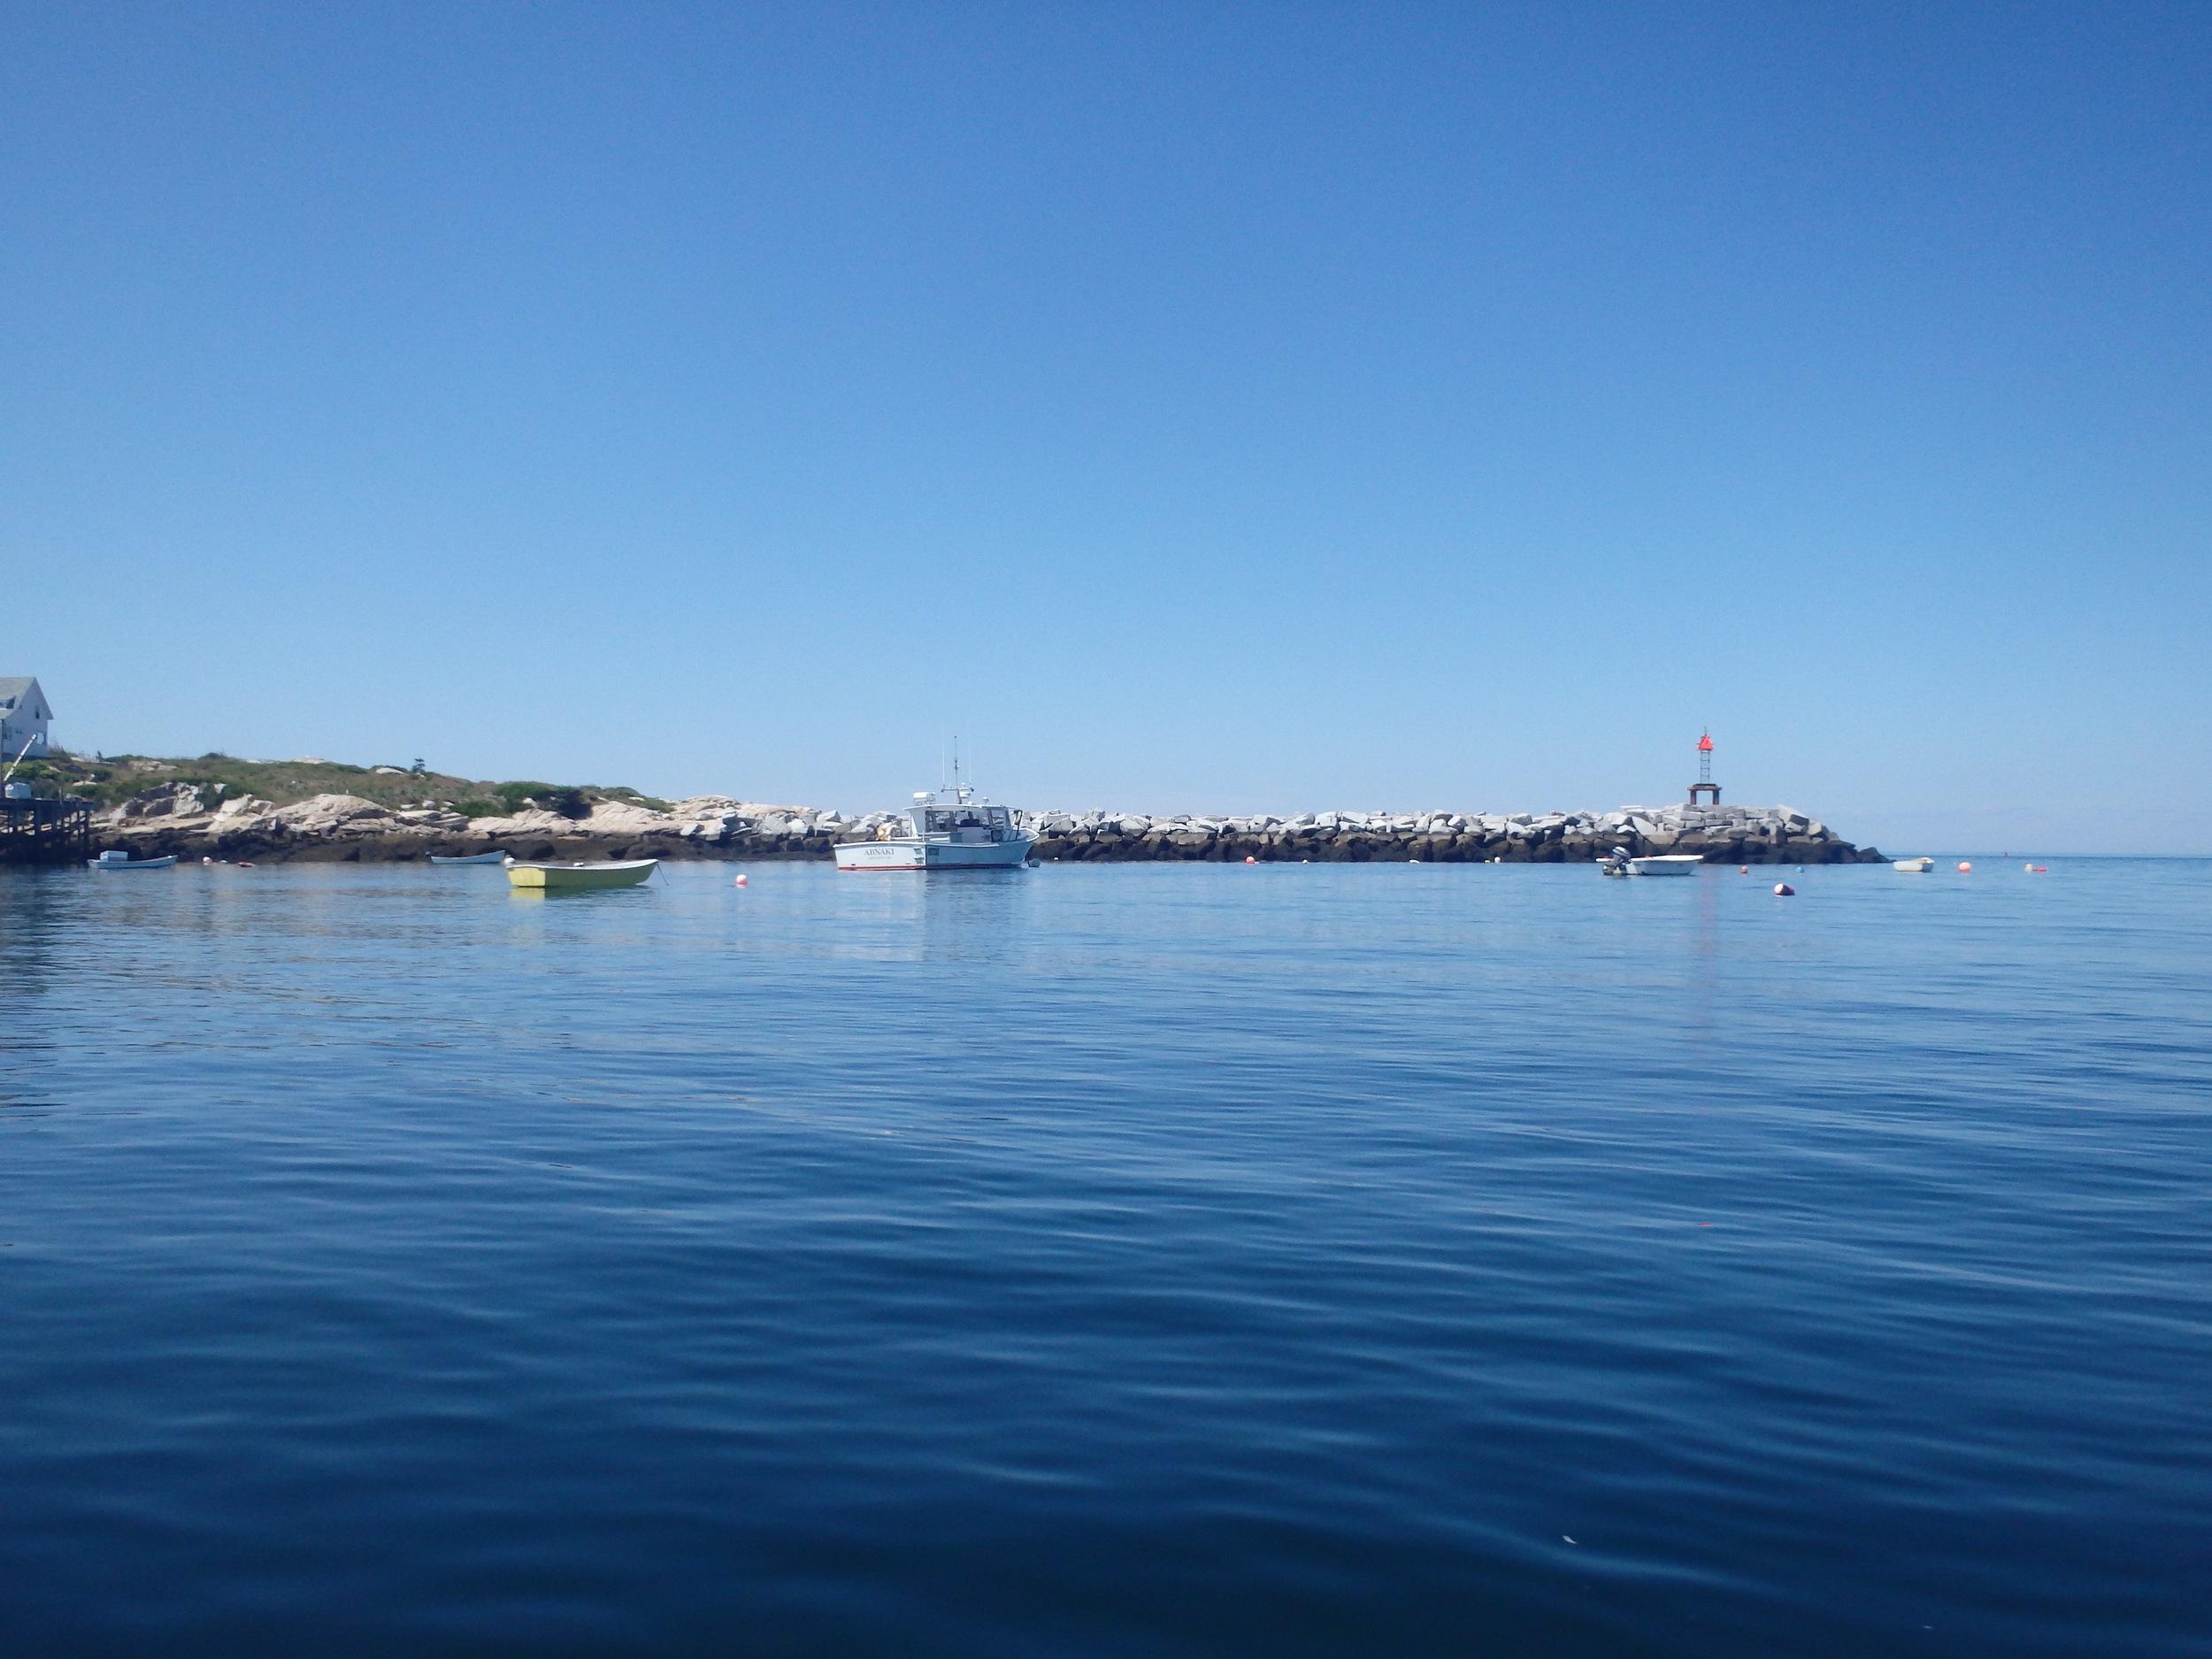 Criehaven jetty